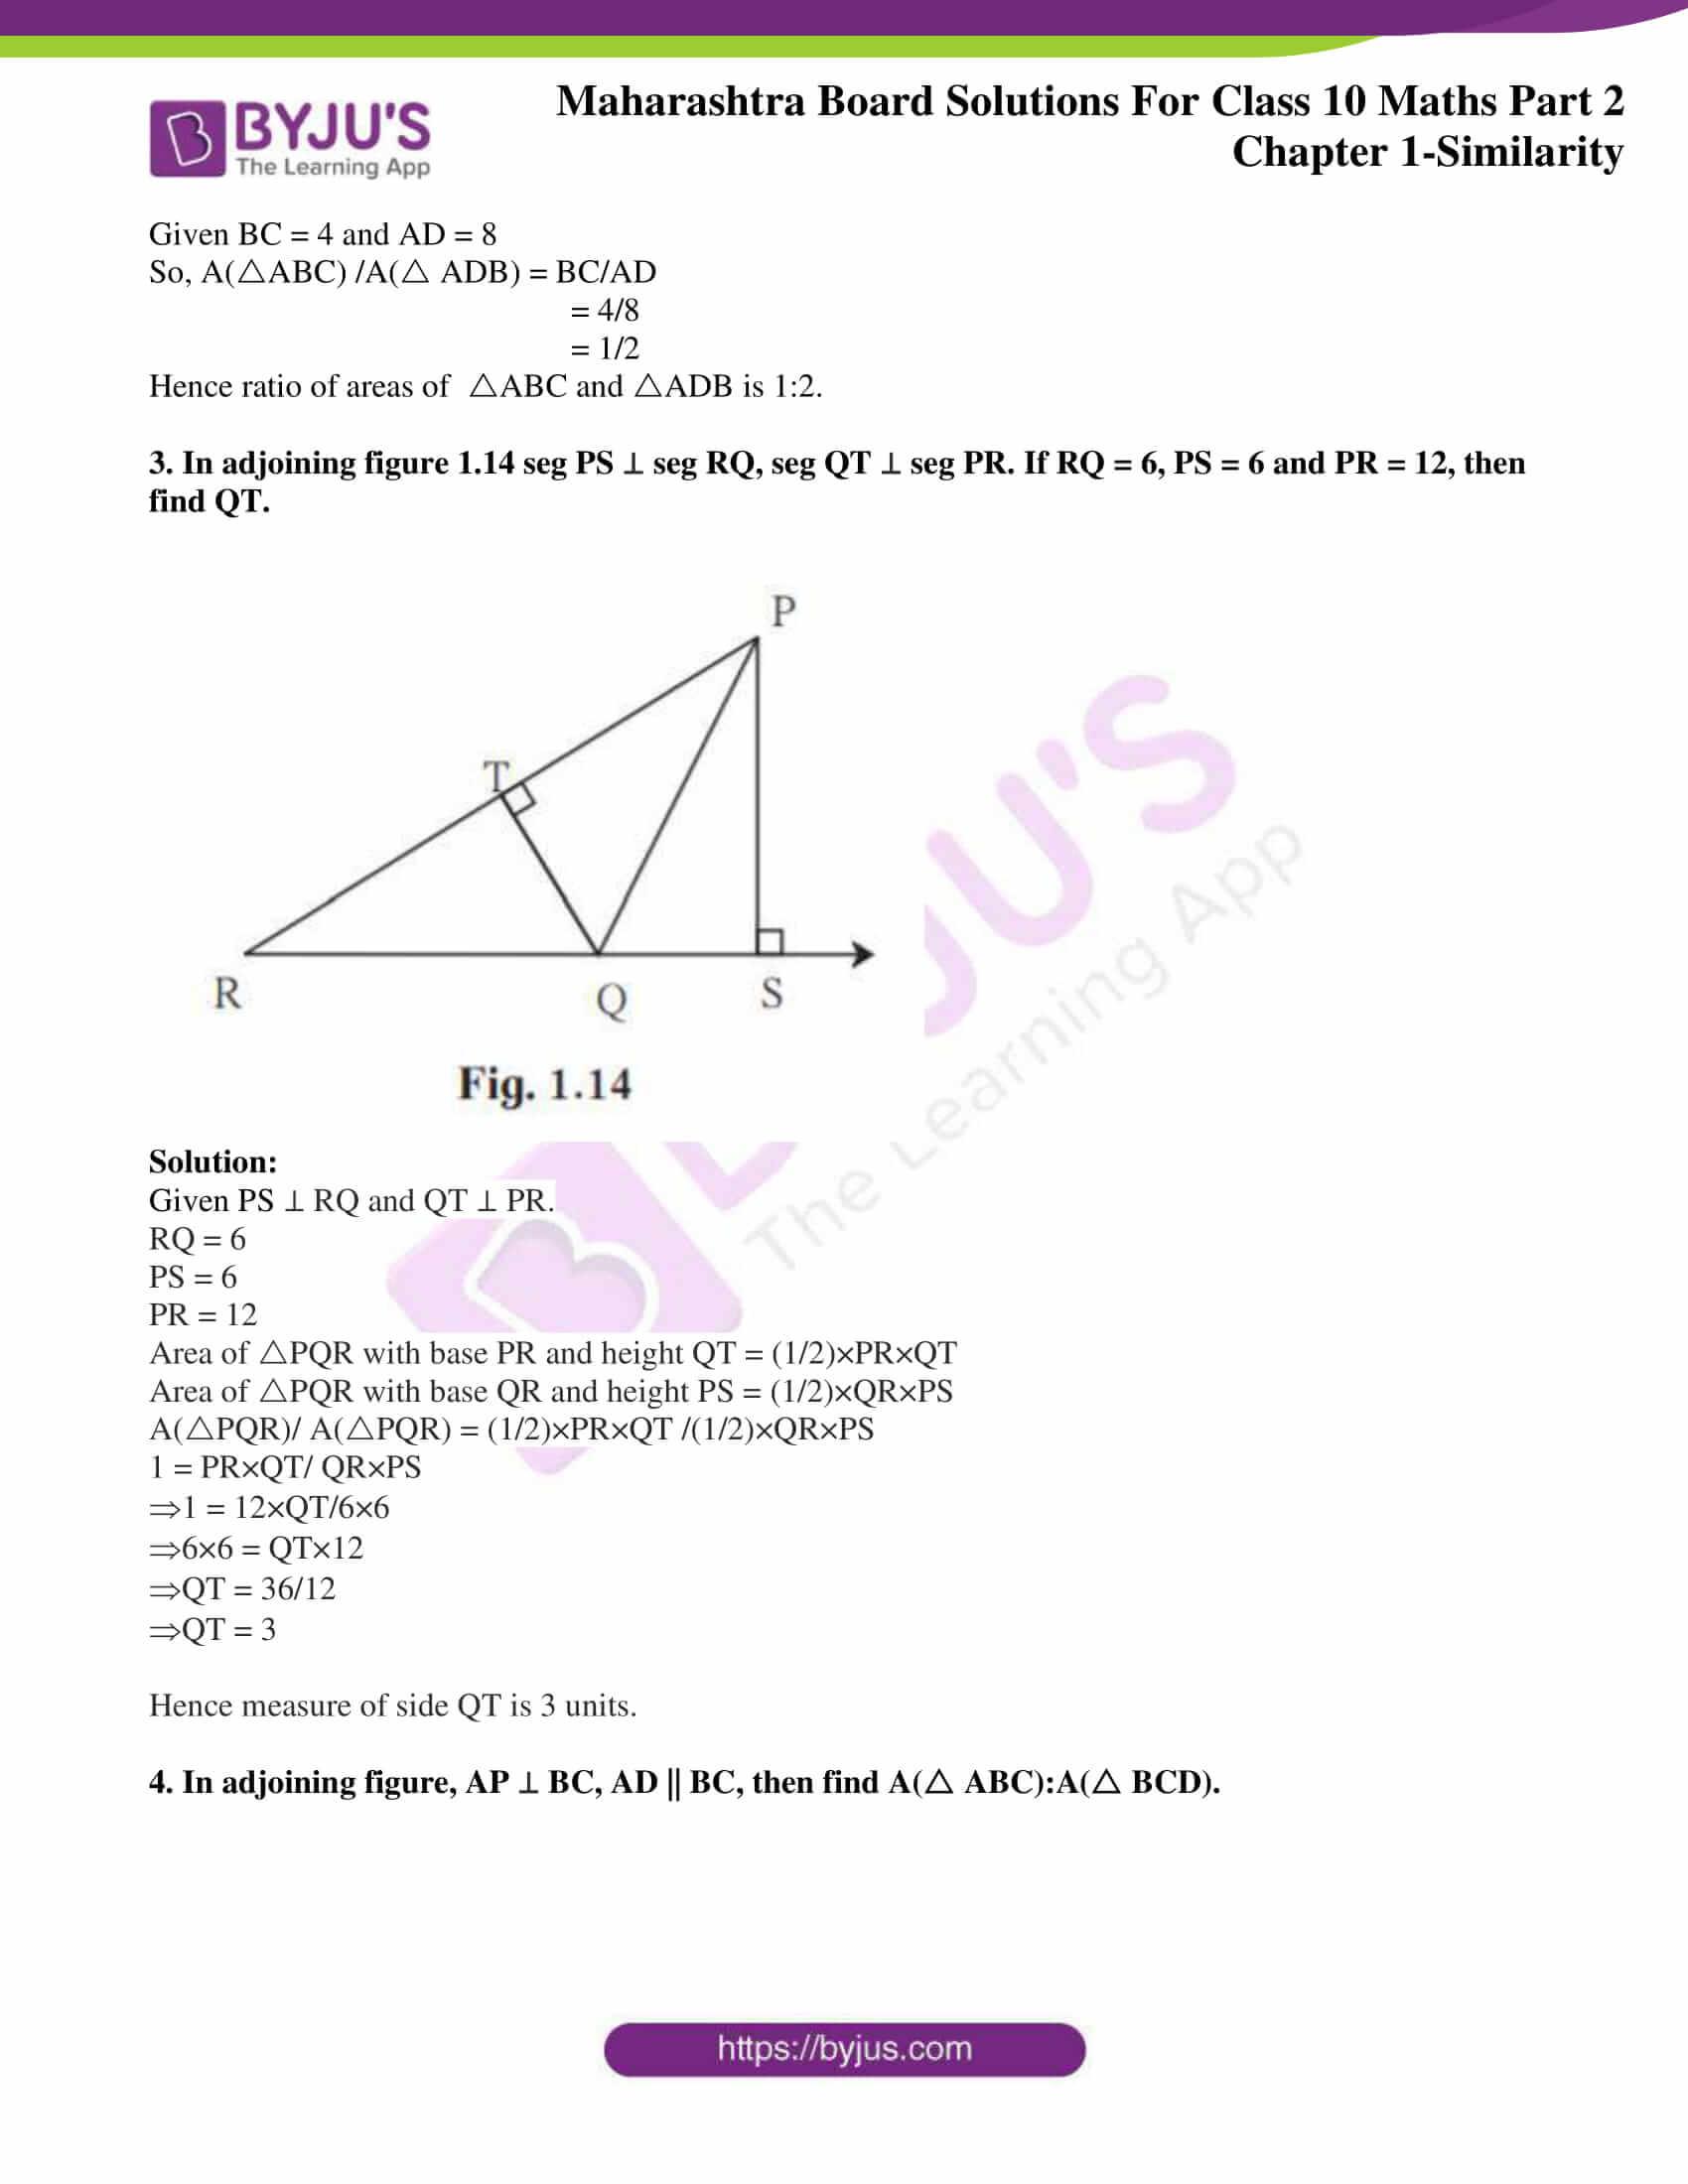 msbshse sol class 10 maths part 2 chapter 1 02